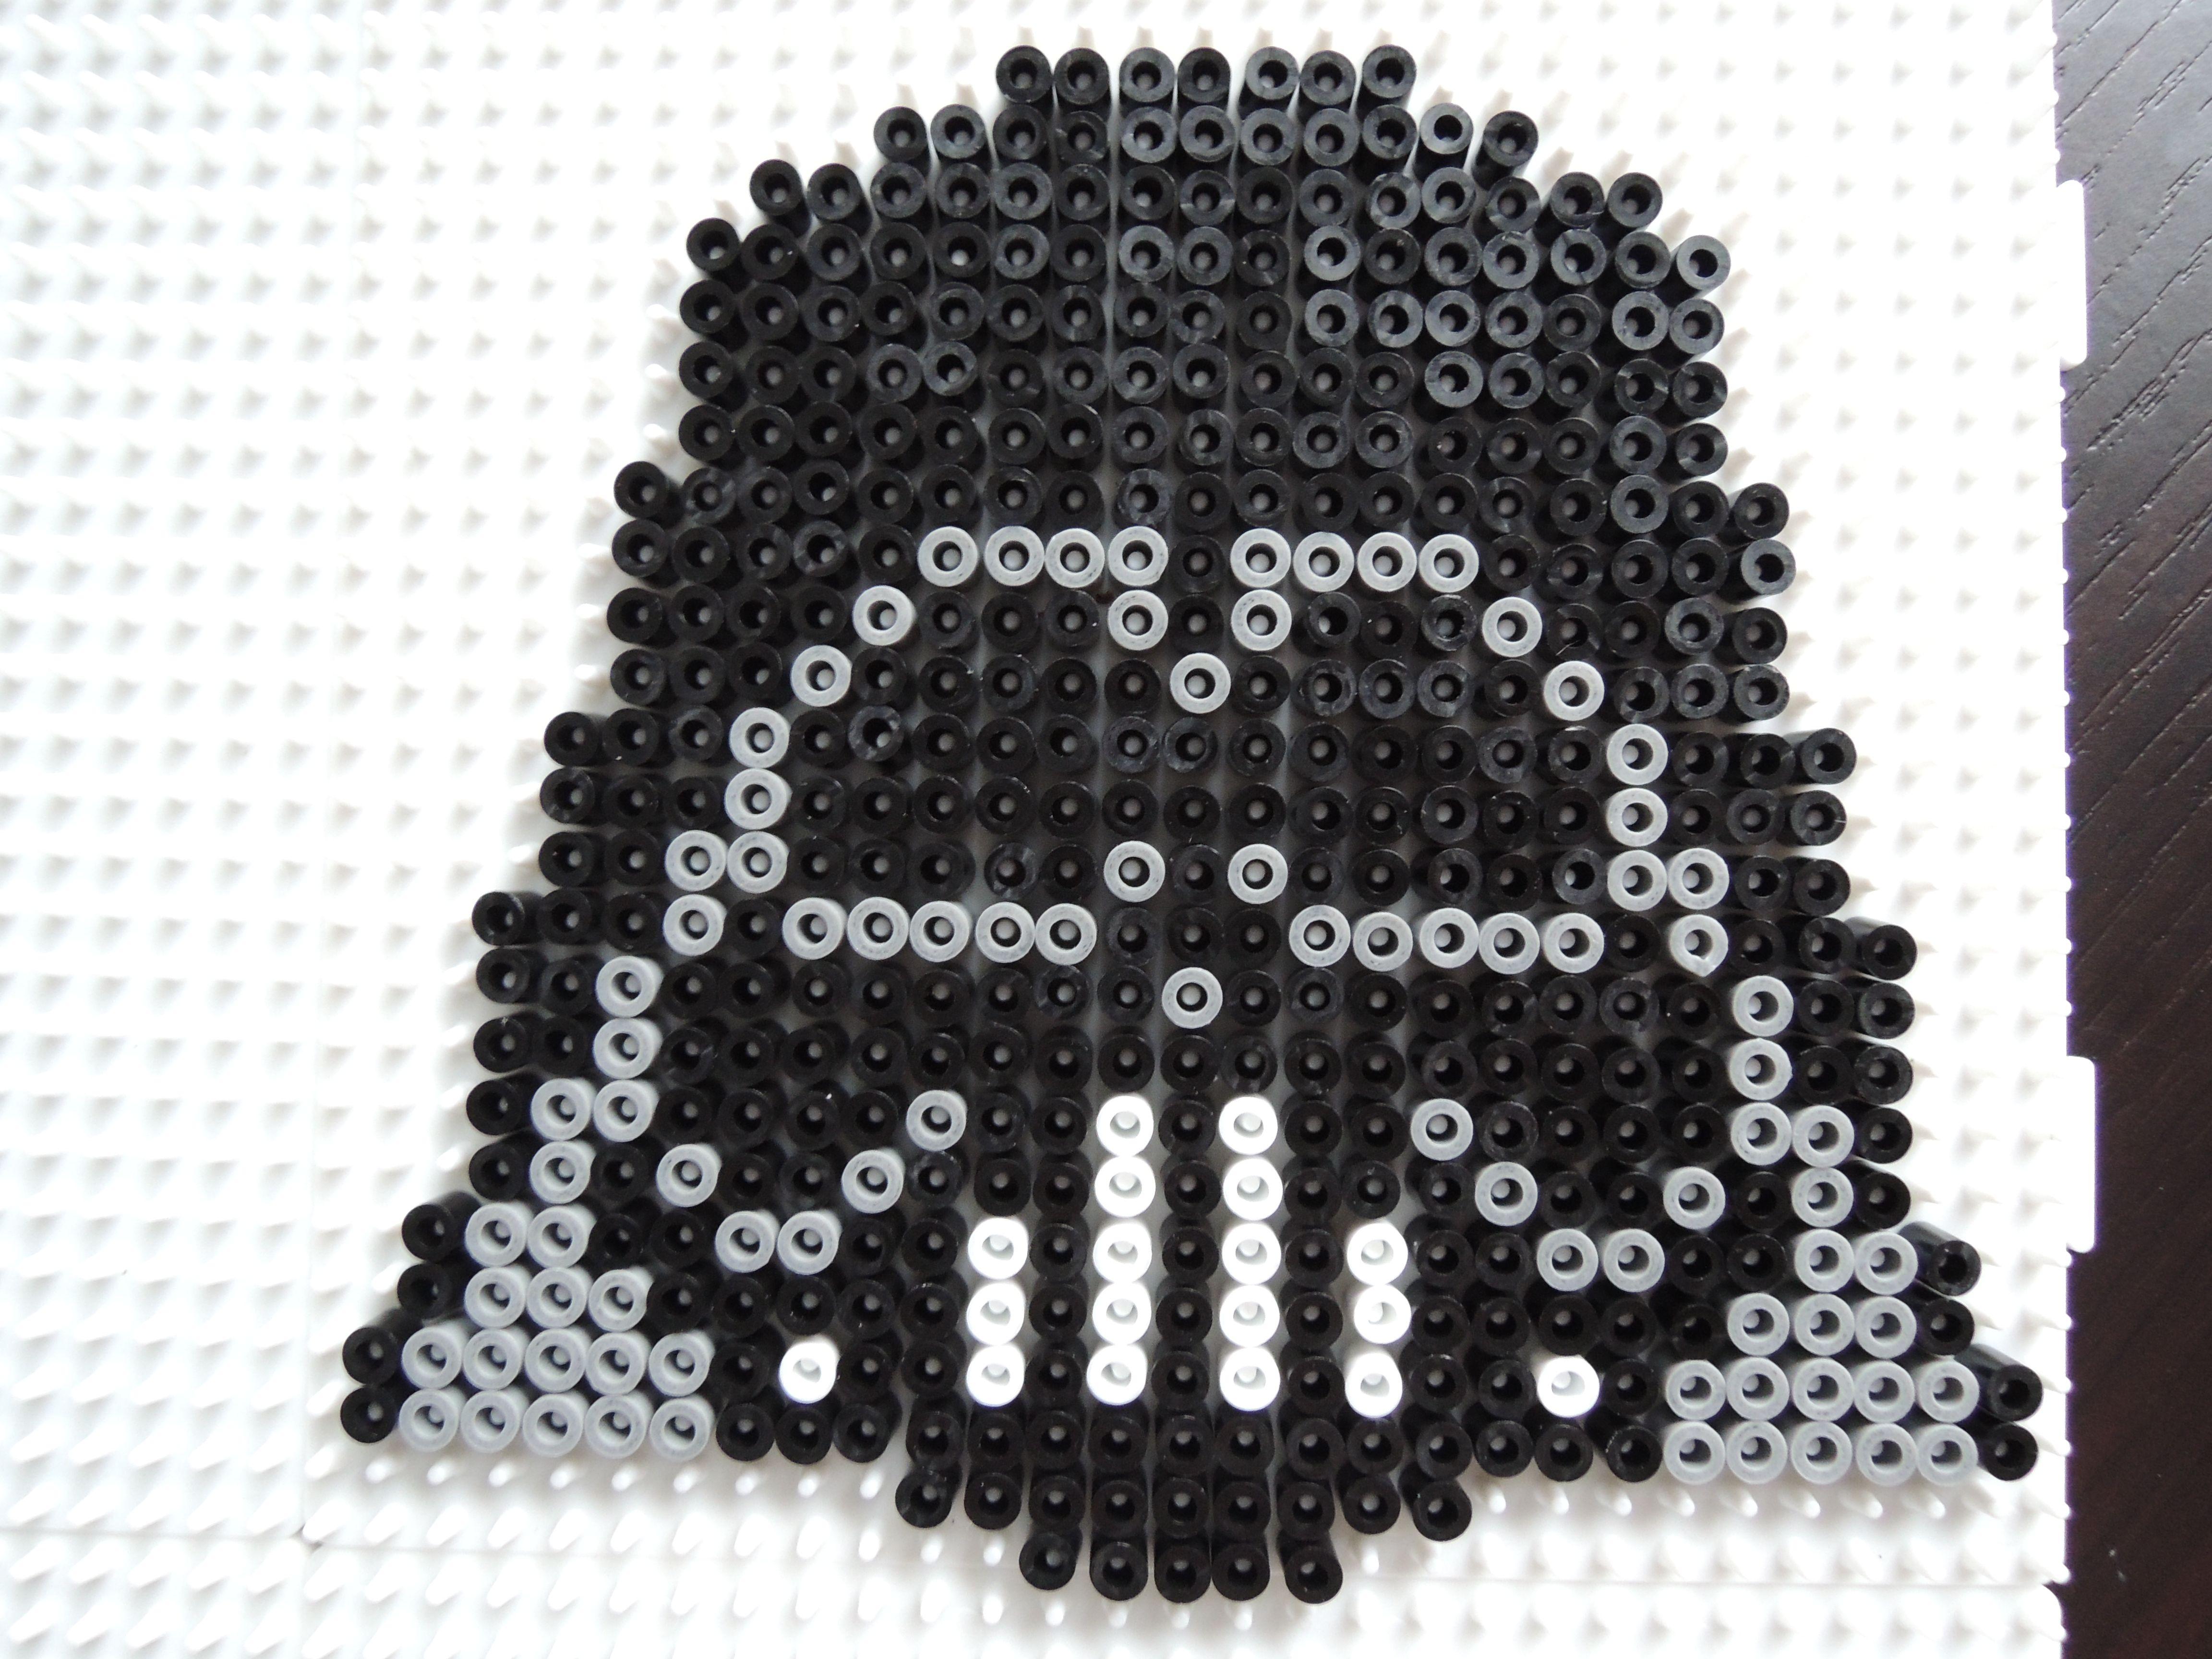 Stormtrooper Star Wars Perler Bead Art By Artbyfredd